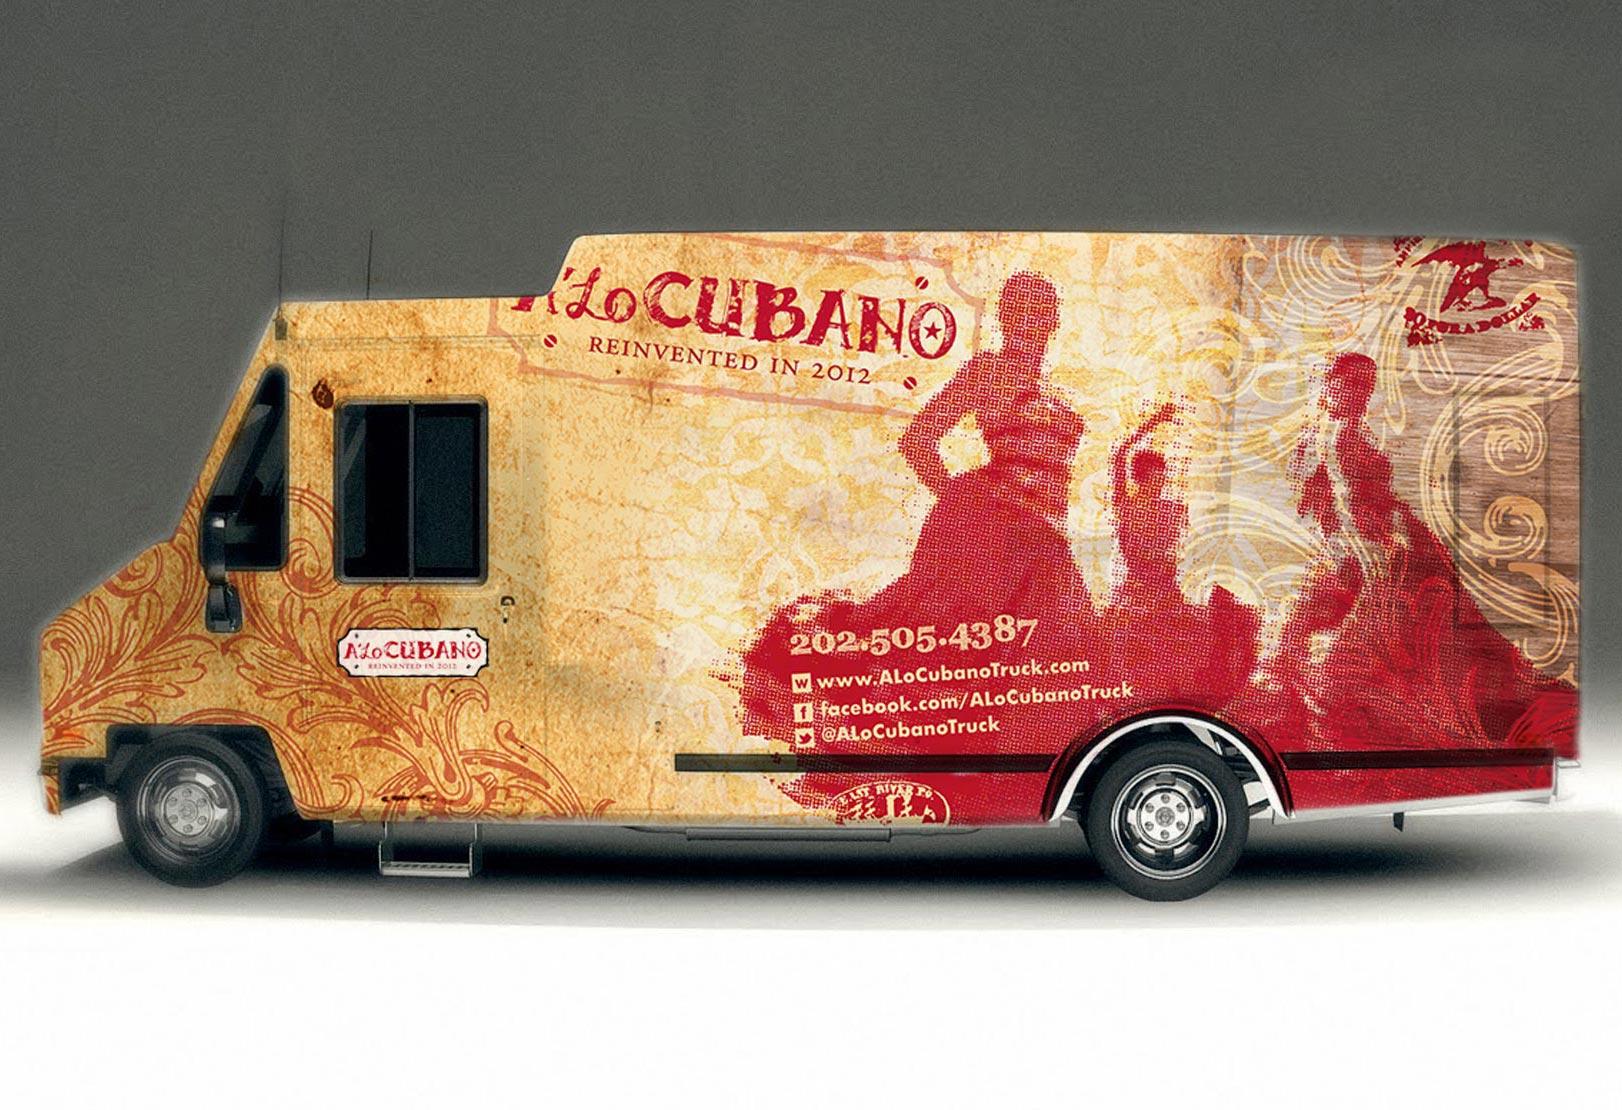 Ingenious Food Truck Design By Yordan Silvera